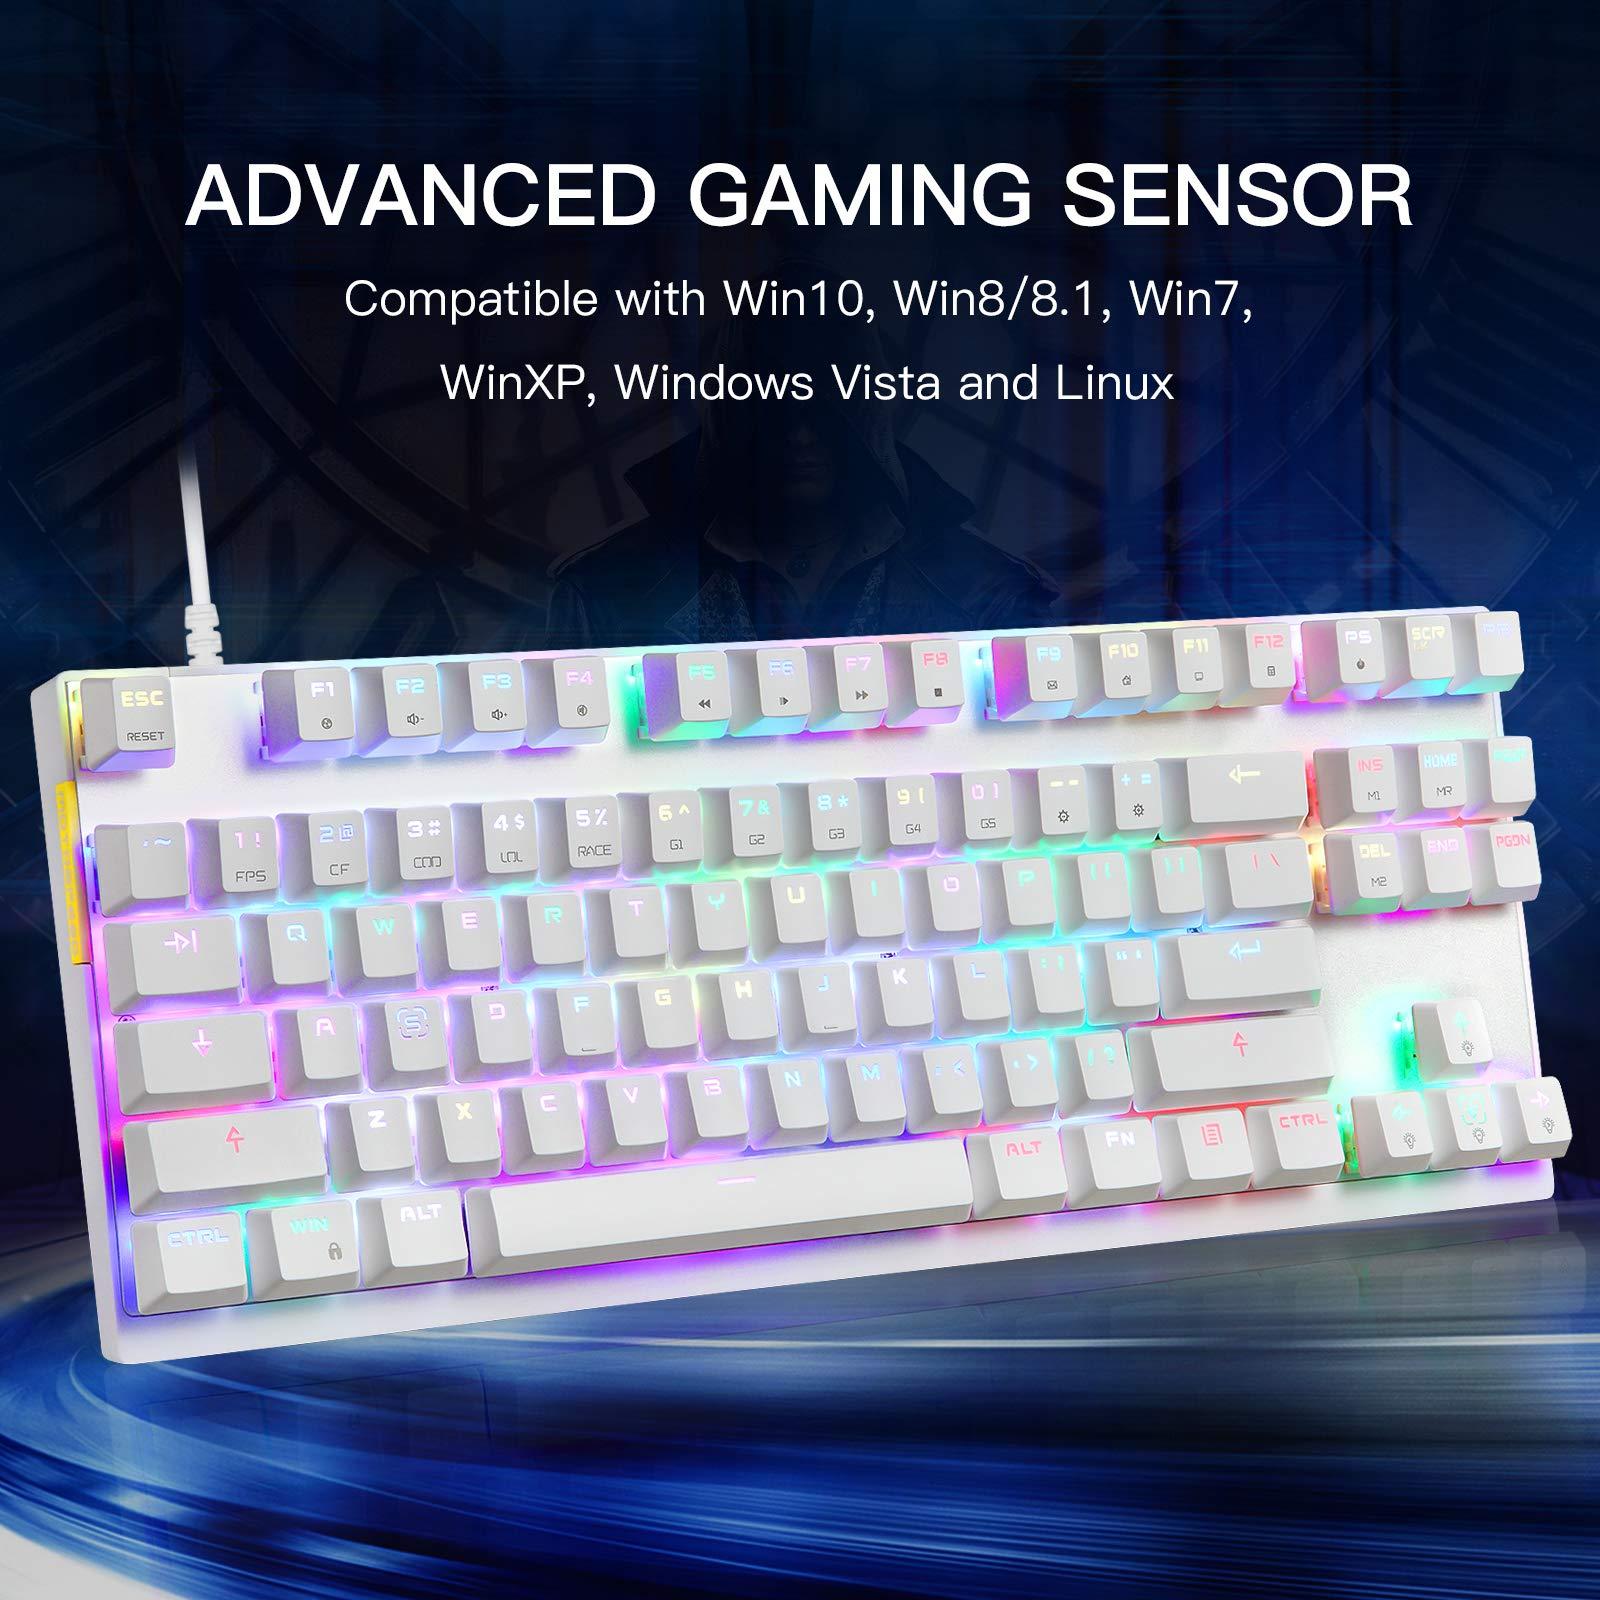 MOTOSPEED Professional Gaming Mechanical Keyboard RGB Rainbow Backlit Compact 87 Keys Wired Gaming Keyboard for Windows Gaming PC